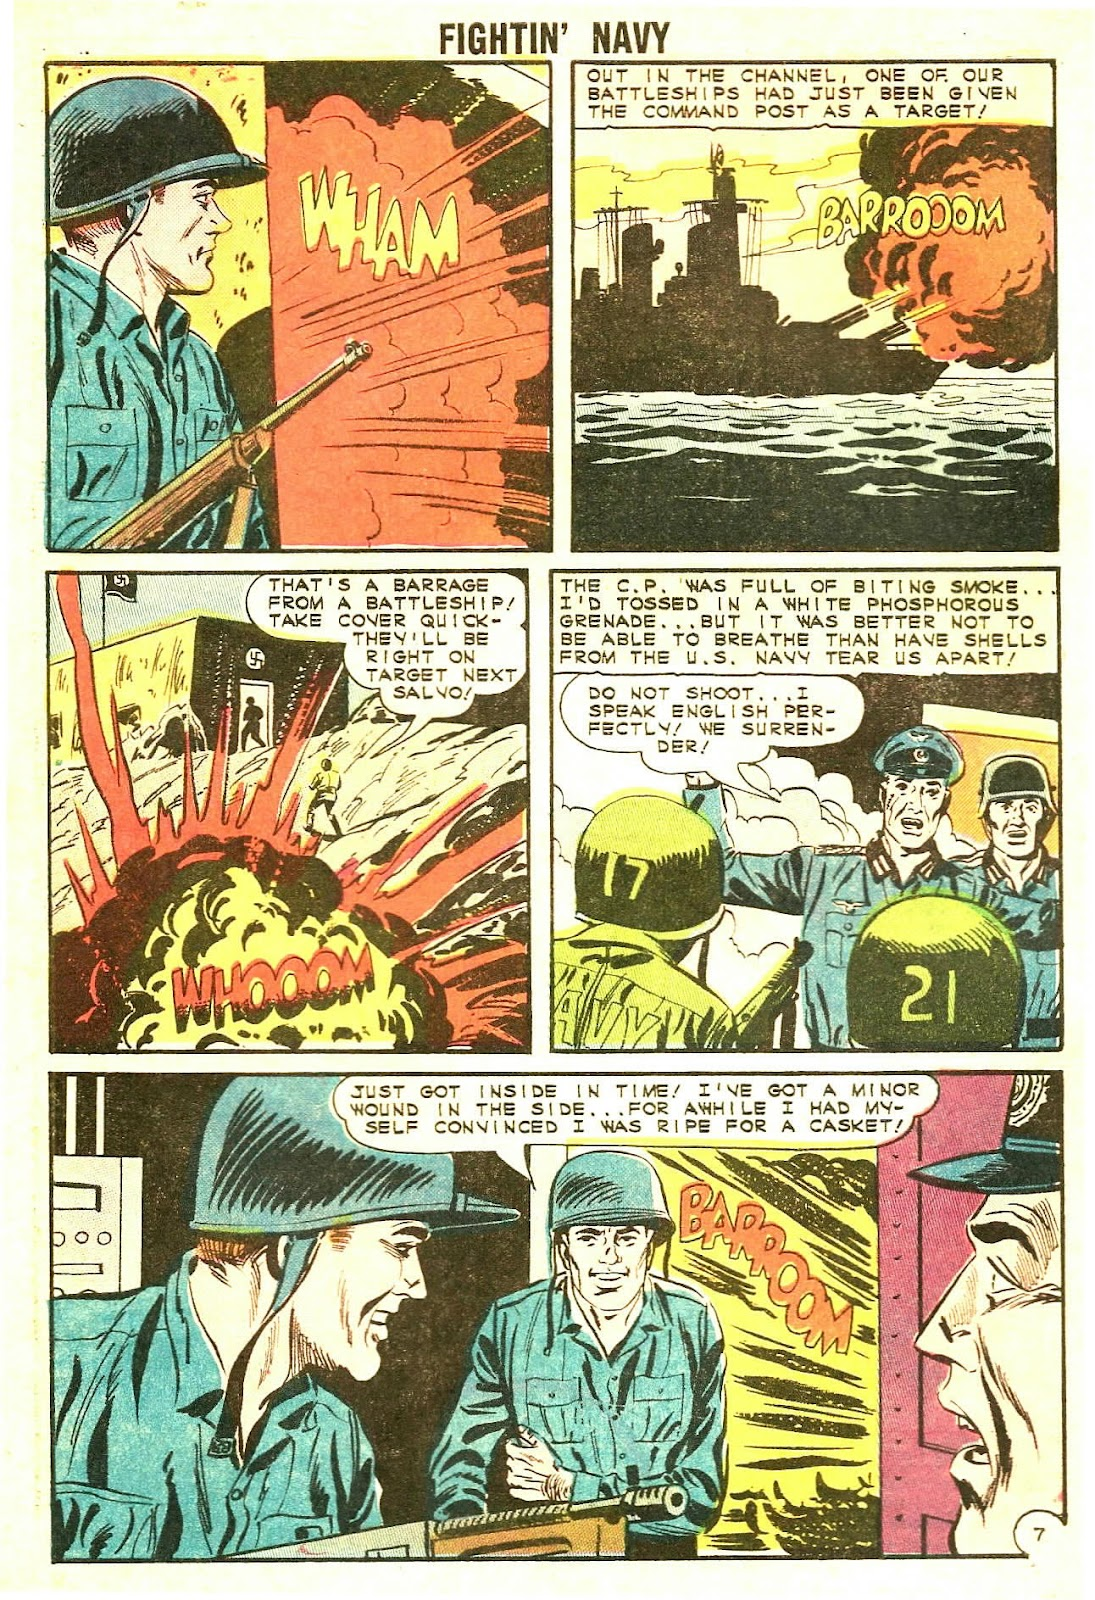 Read online Fightin' Navy comic -  Issue #117 - 32